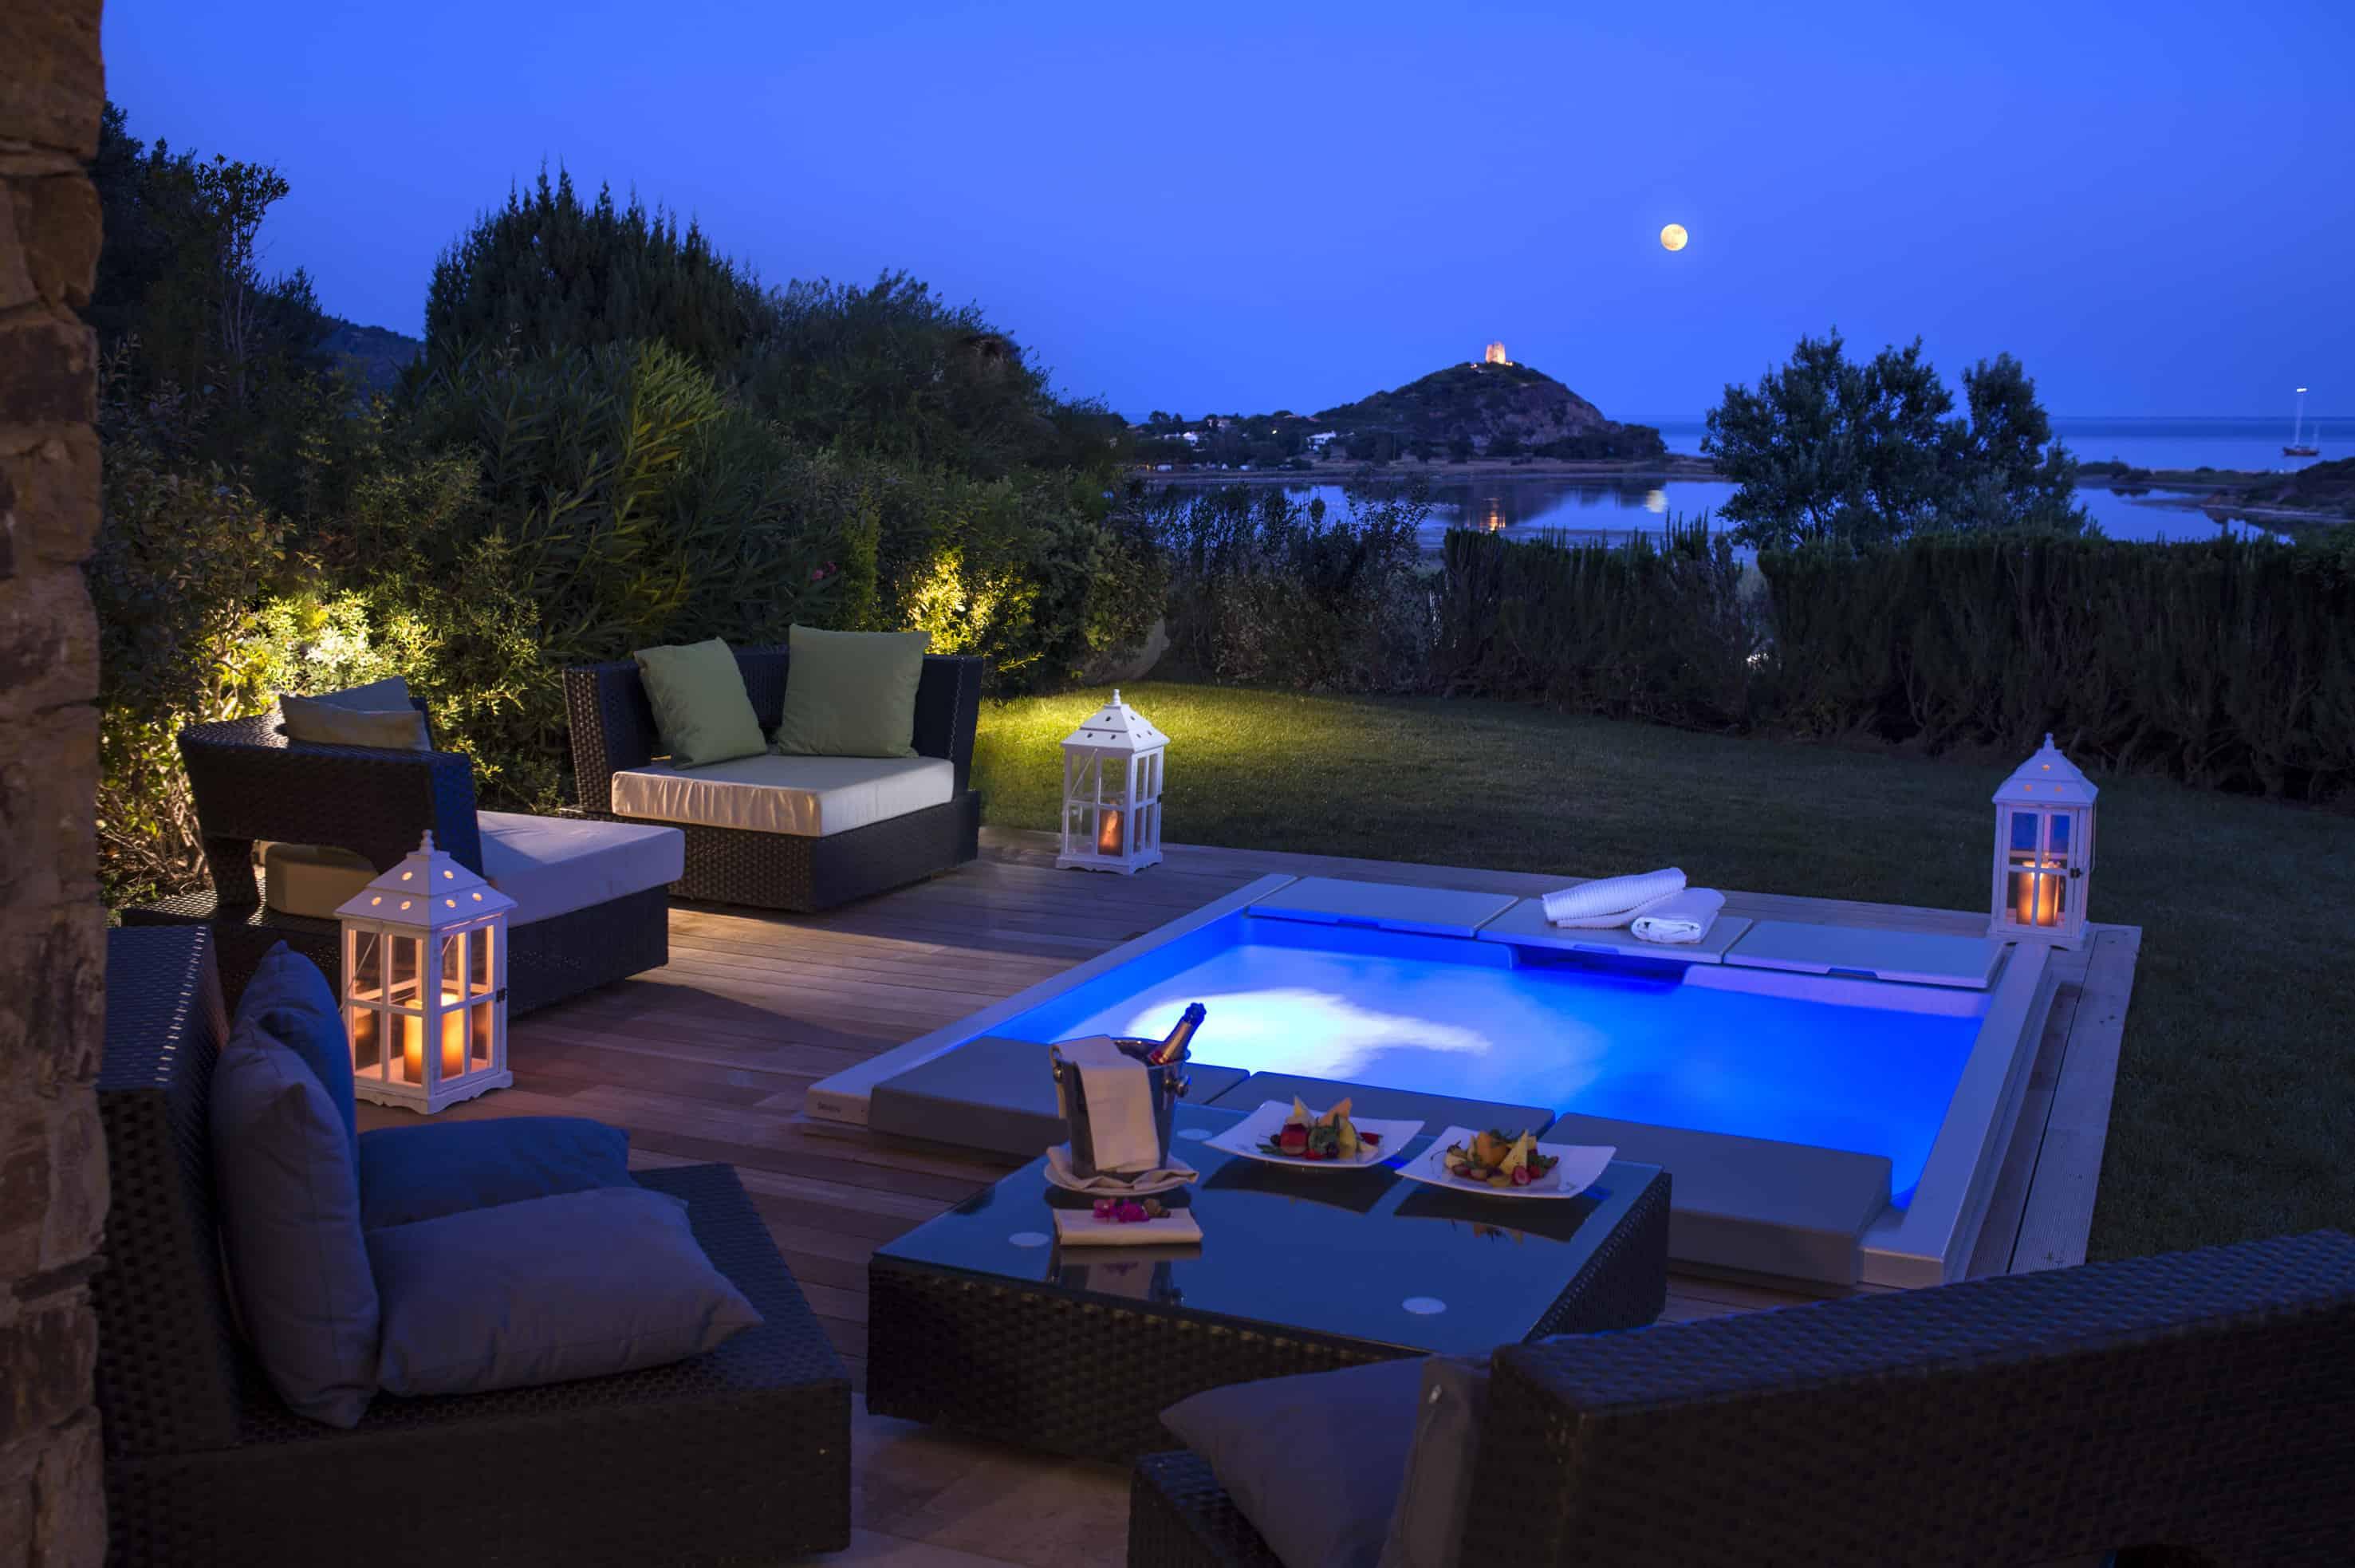 chia laguna resort chia laguna holiday resort sardinia. Black Bedroom Furniture Sets. Home Design Ideas